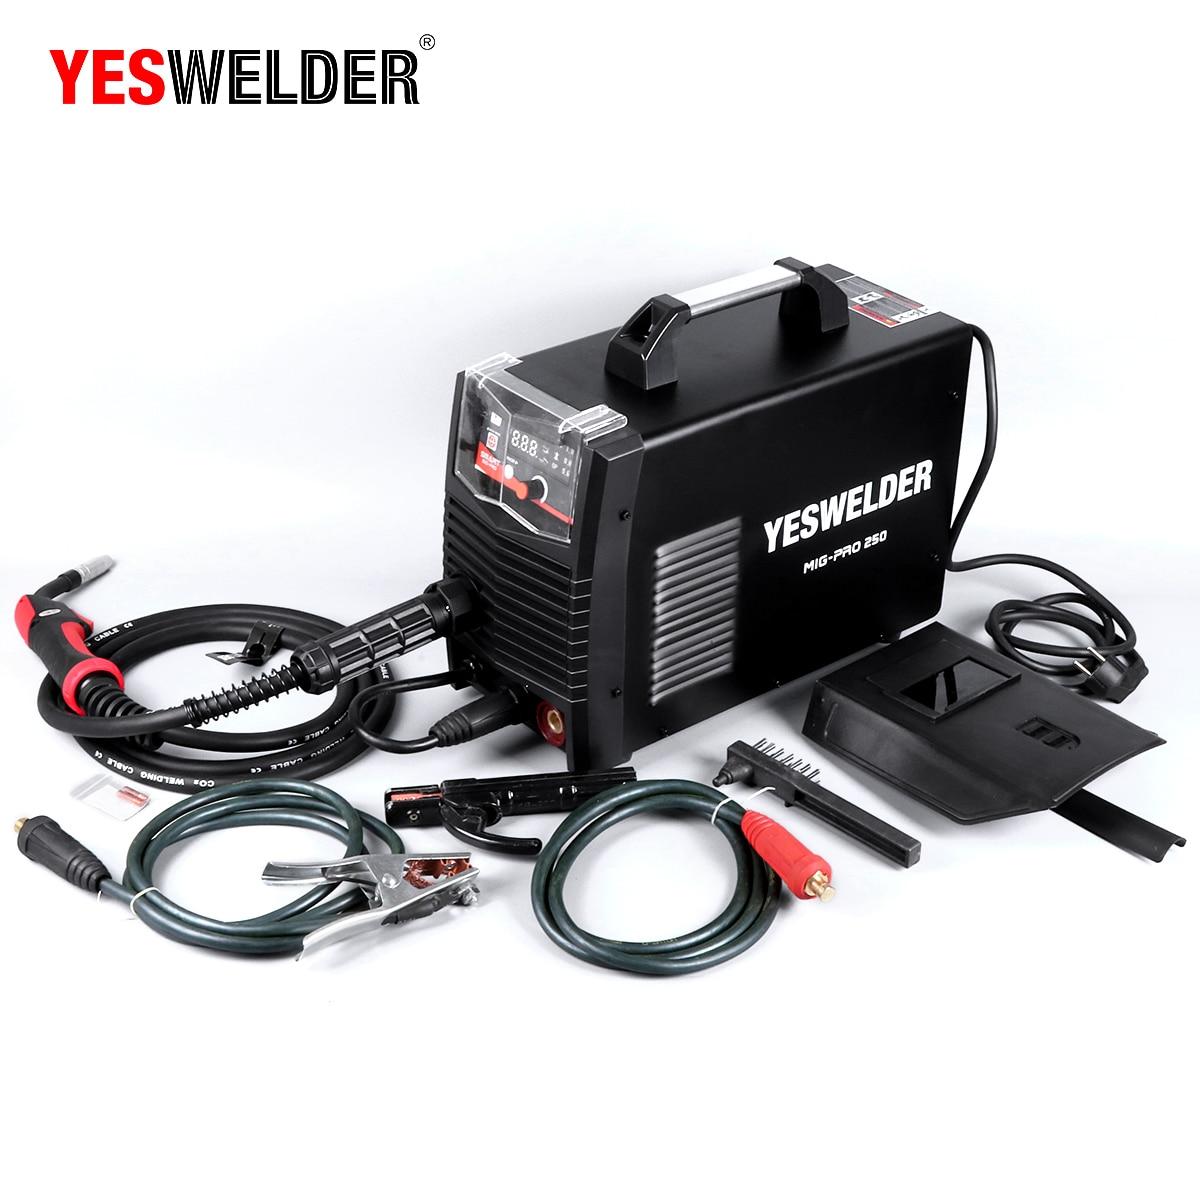 Image 3 - YESWELDER MIG250A No Gas and Gas MIG Welding Machine MIG Welder With Light Weight Single Phase 220V Iron WelderMIG Welders   - AliExpress